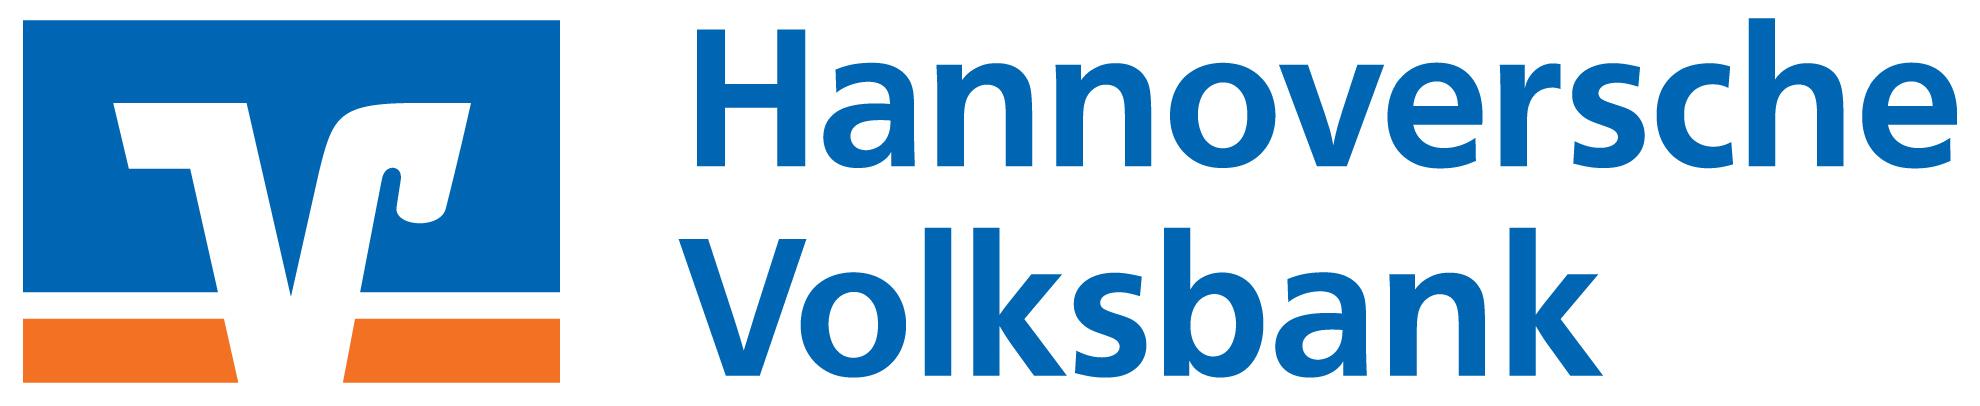 Hannoversche Volksbank eG KompetenzCenter Berenbostel